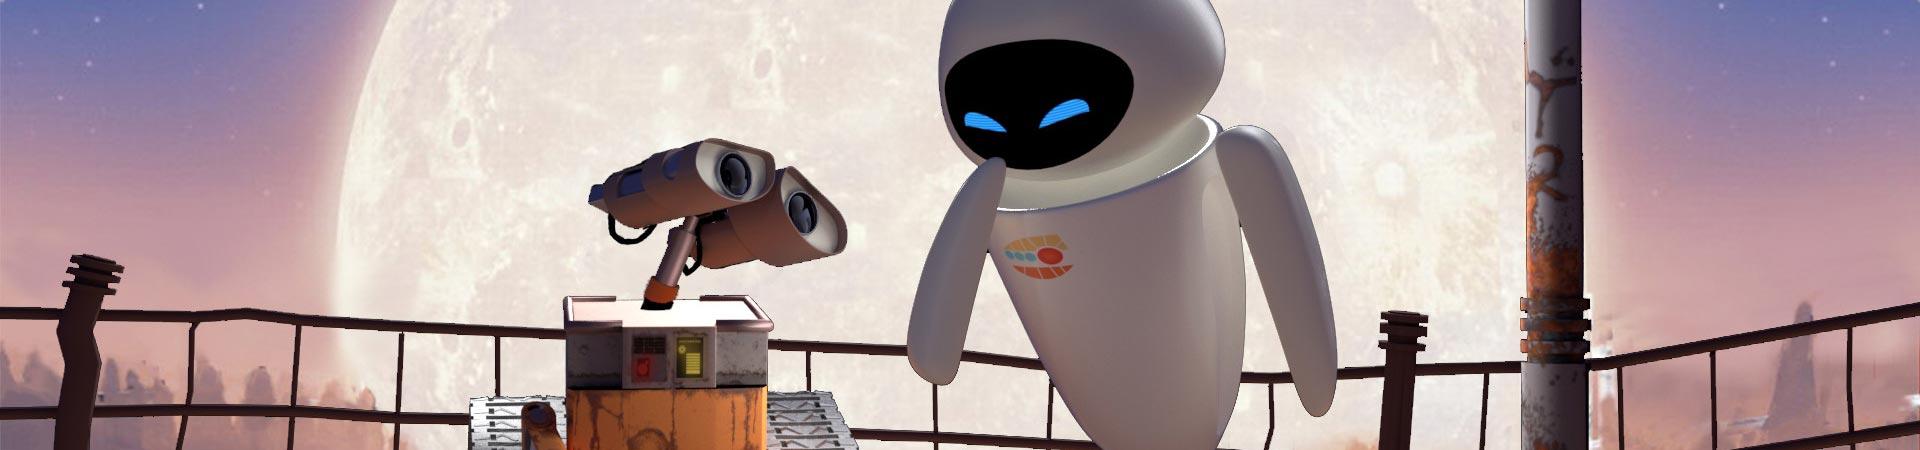 MainSlider-WALL-E